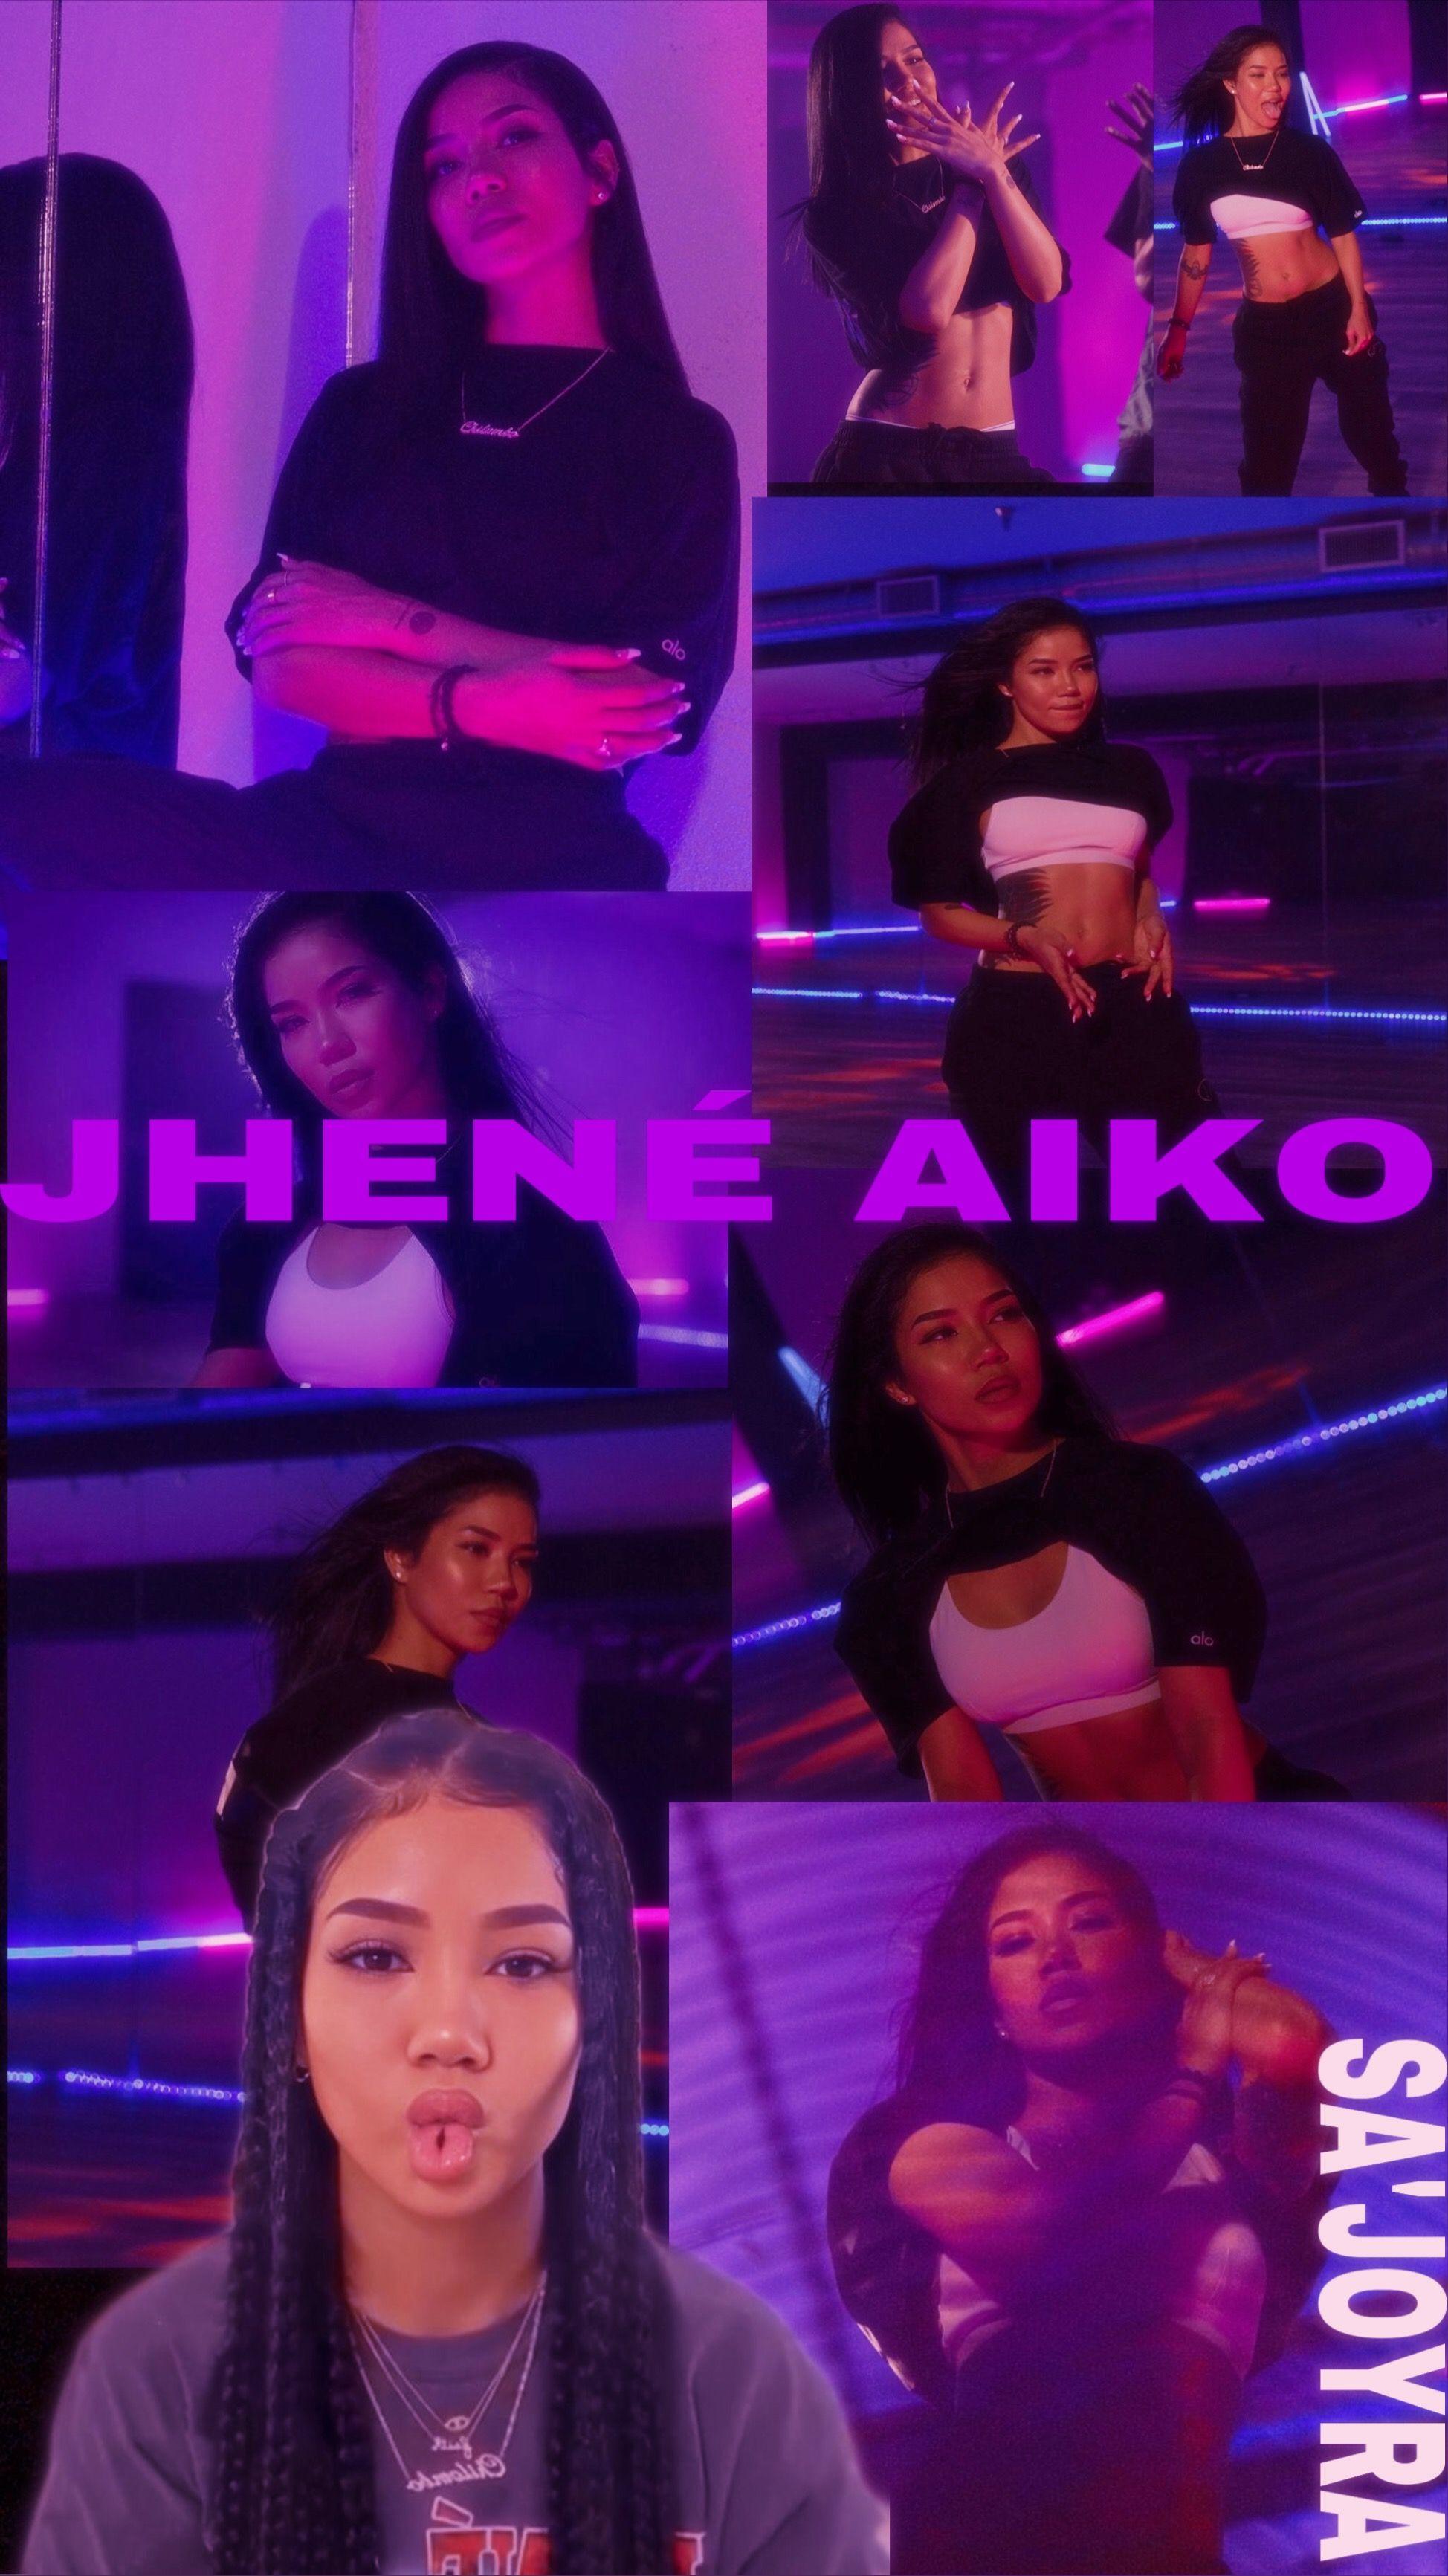 Jhene Aiko Love U Forever Jhene Aiko Aiko